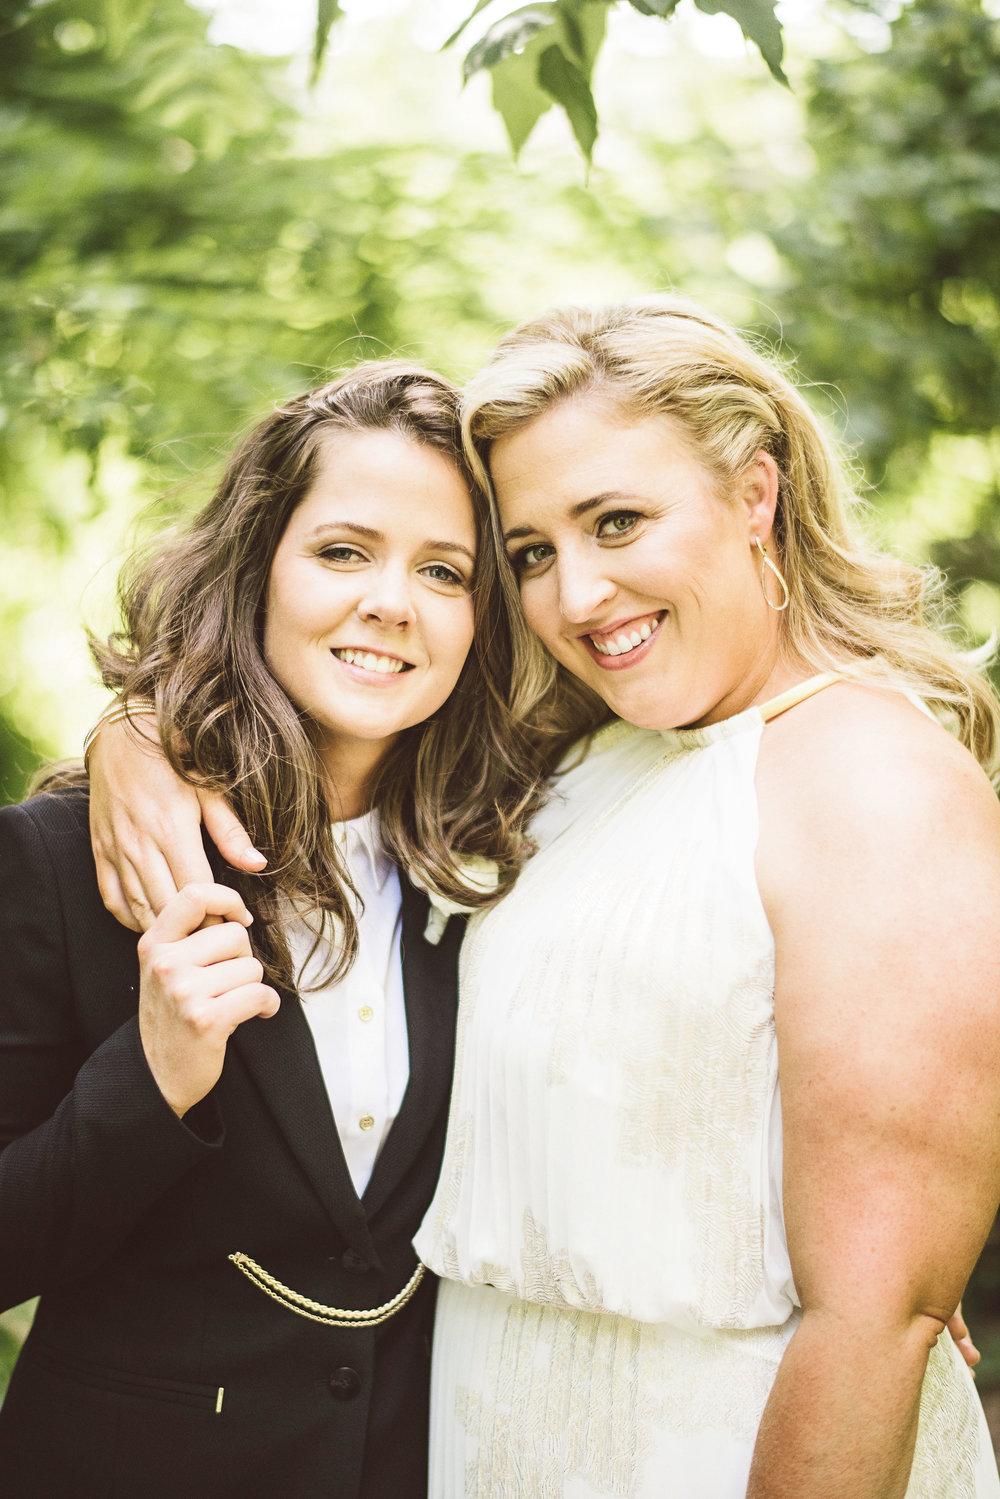 alyssa_elizabeth_machine_shop_minneapolis_wedding_by_lucas_botz_DSC_7132.jpg